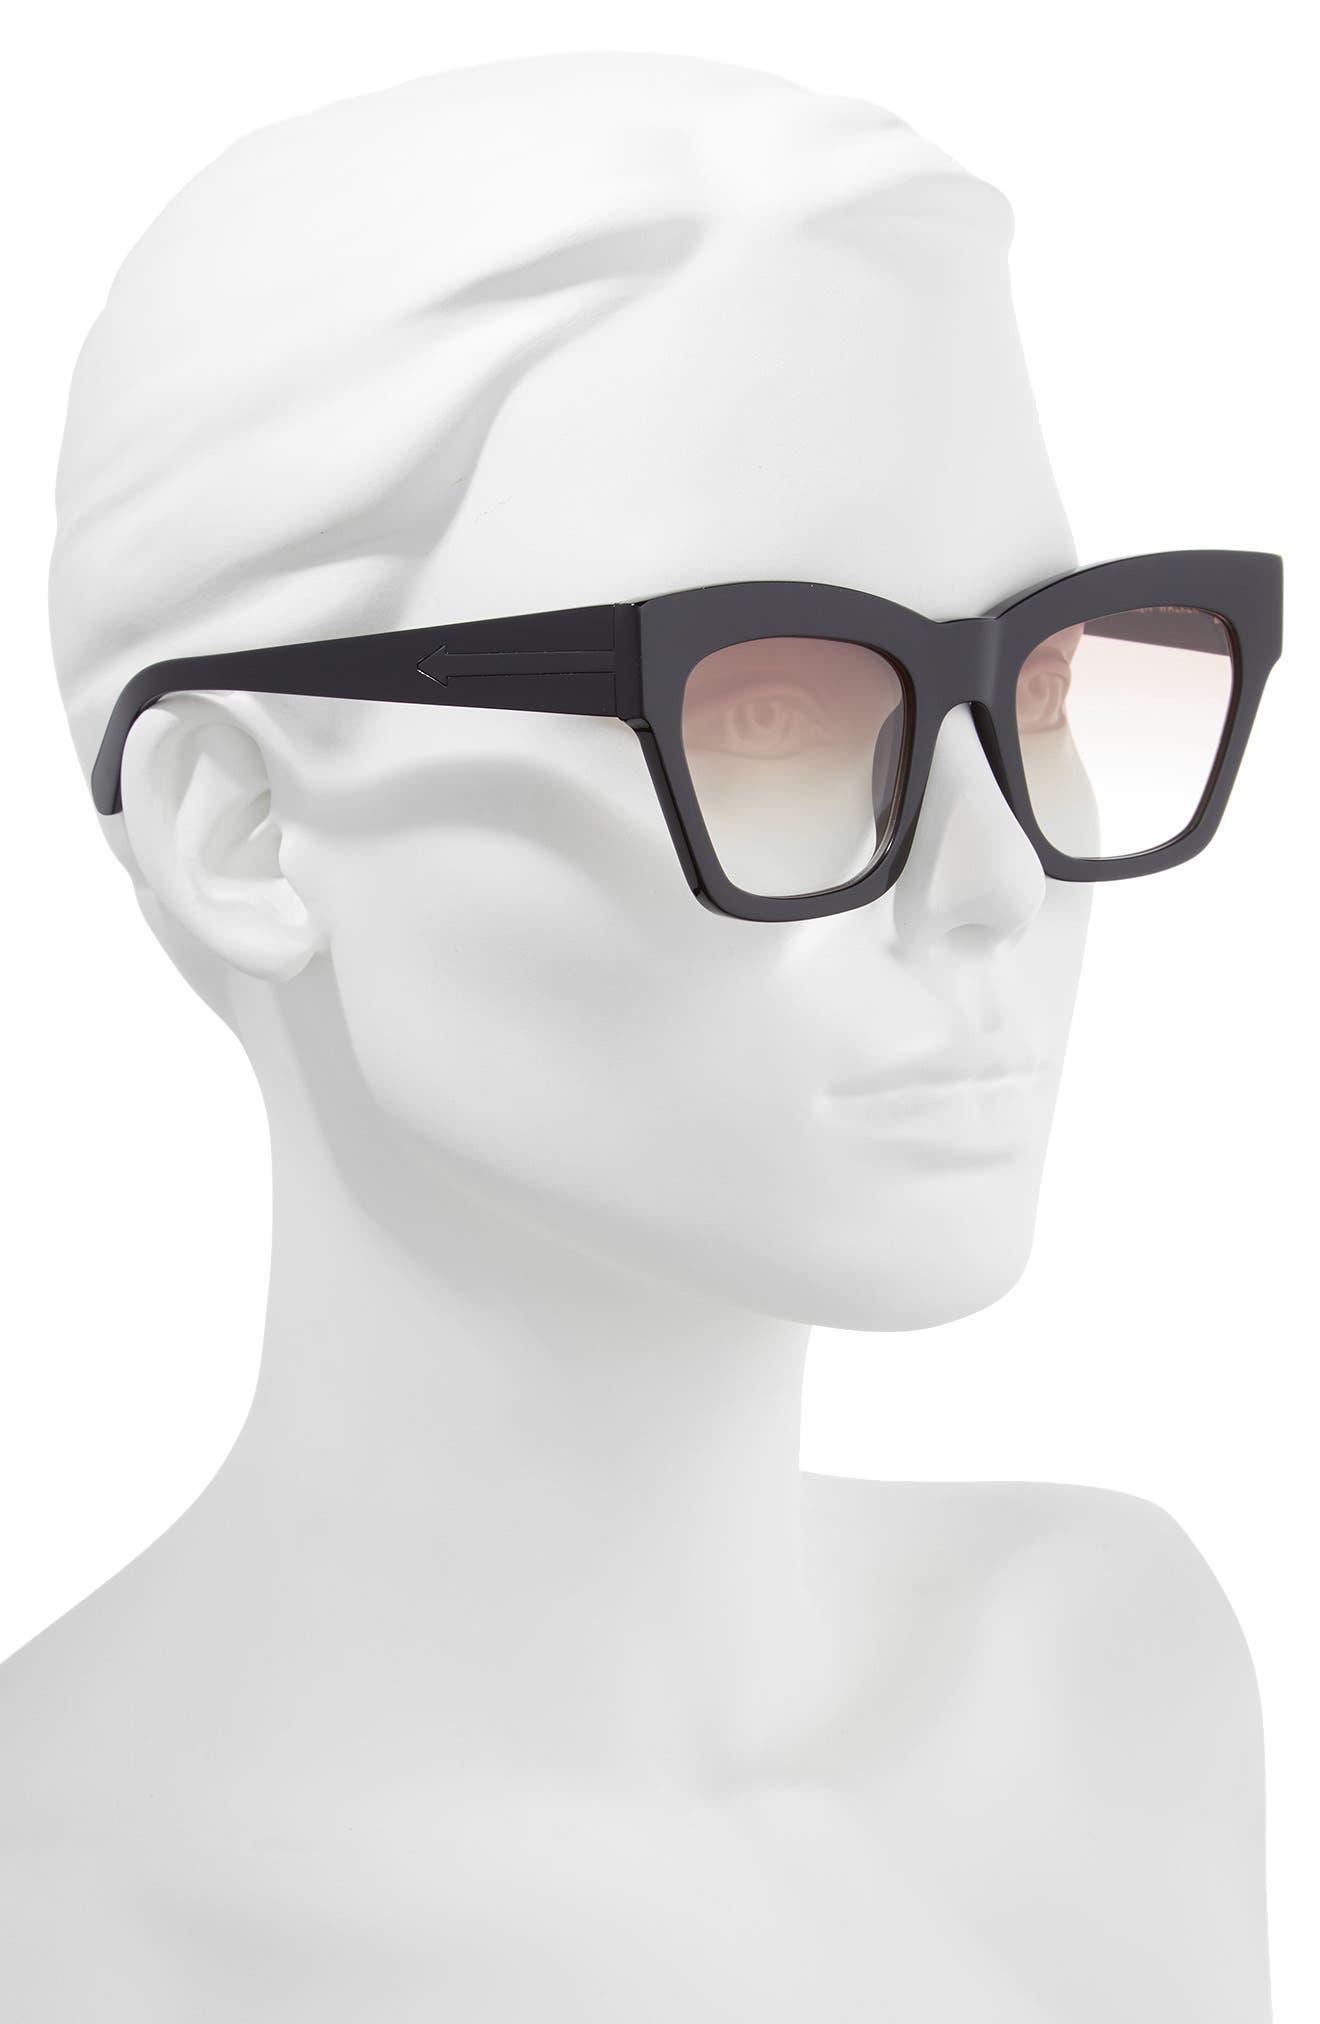 Treasure 52mm Cat Eye Sunglasses,                             Alternate thumbnail 2, color,                             Shiny Black/ Brown